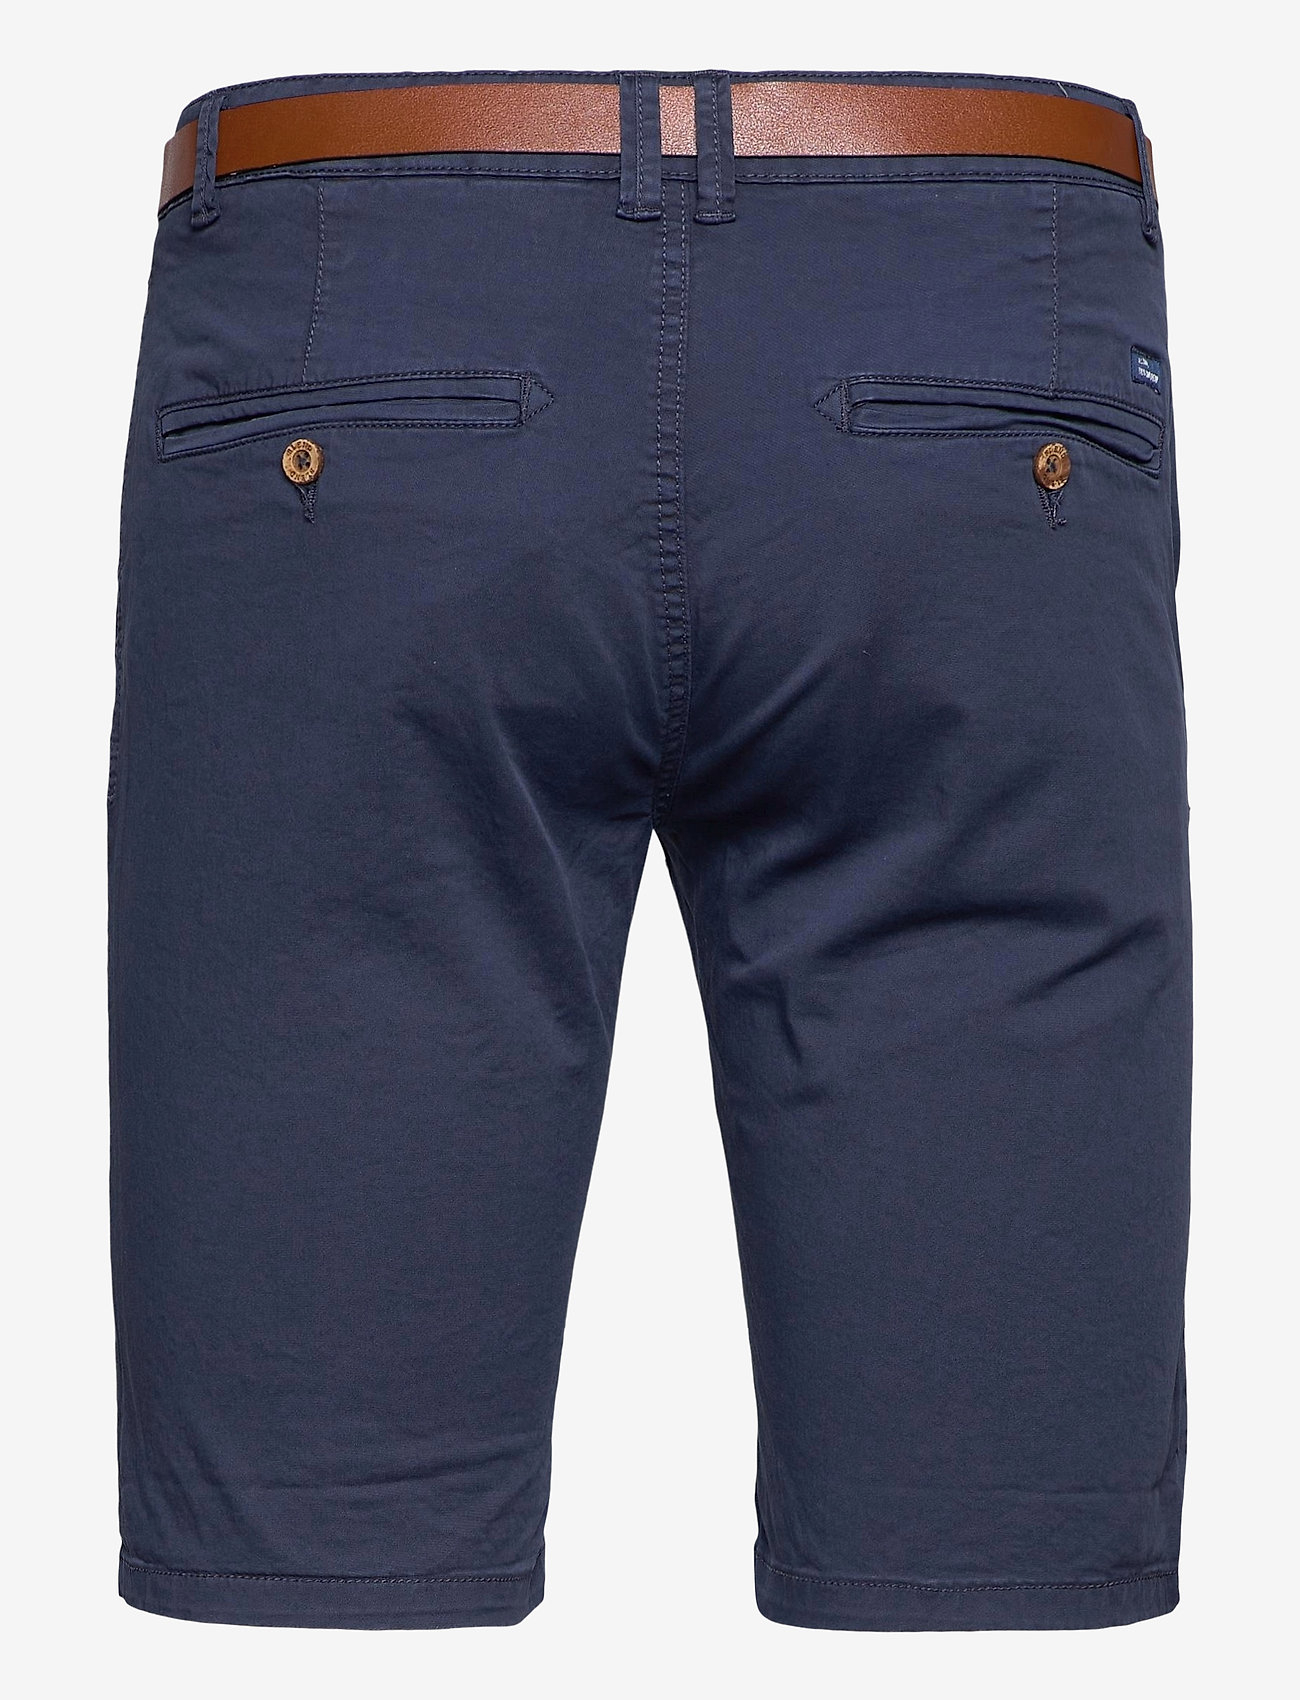 Blend - Shorts - chino's shorts - dress blues - 1